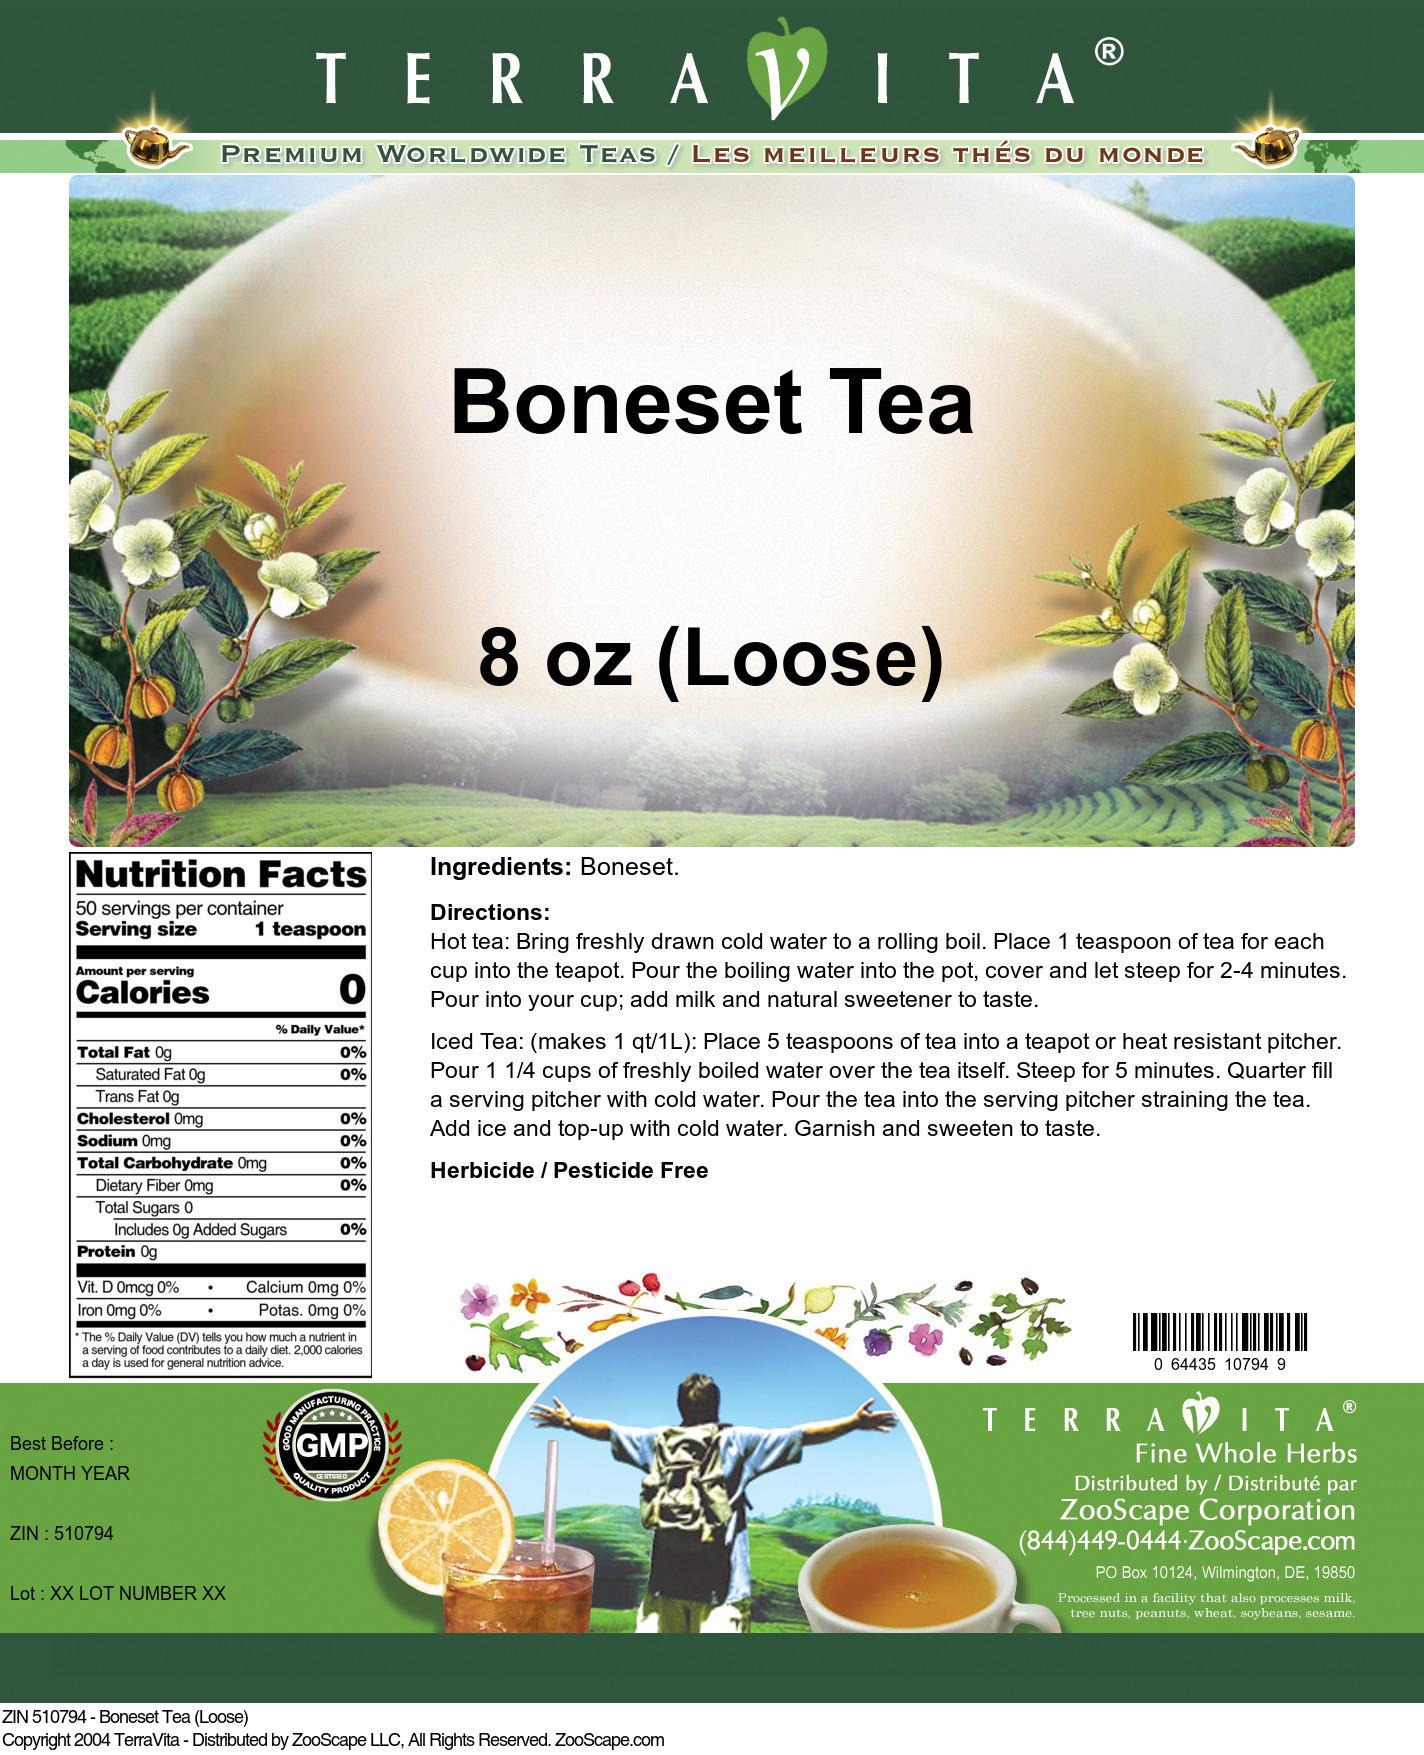 Boneset Tea (Loose)